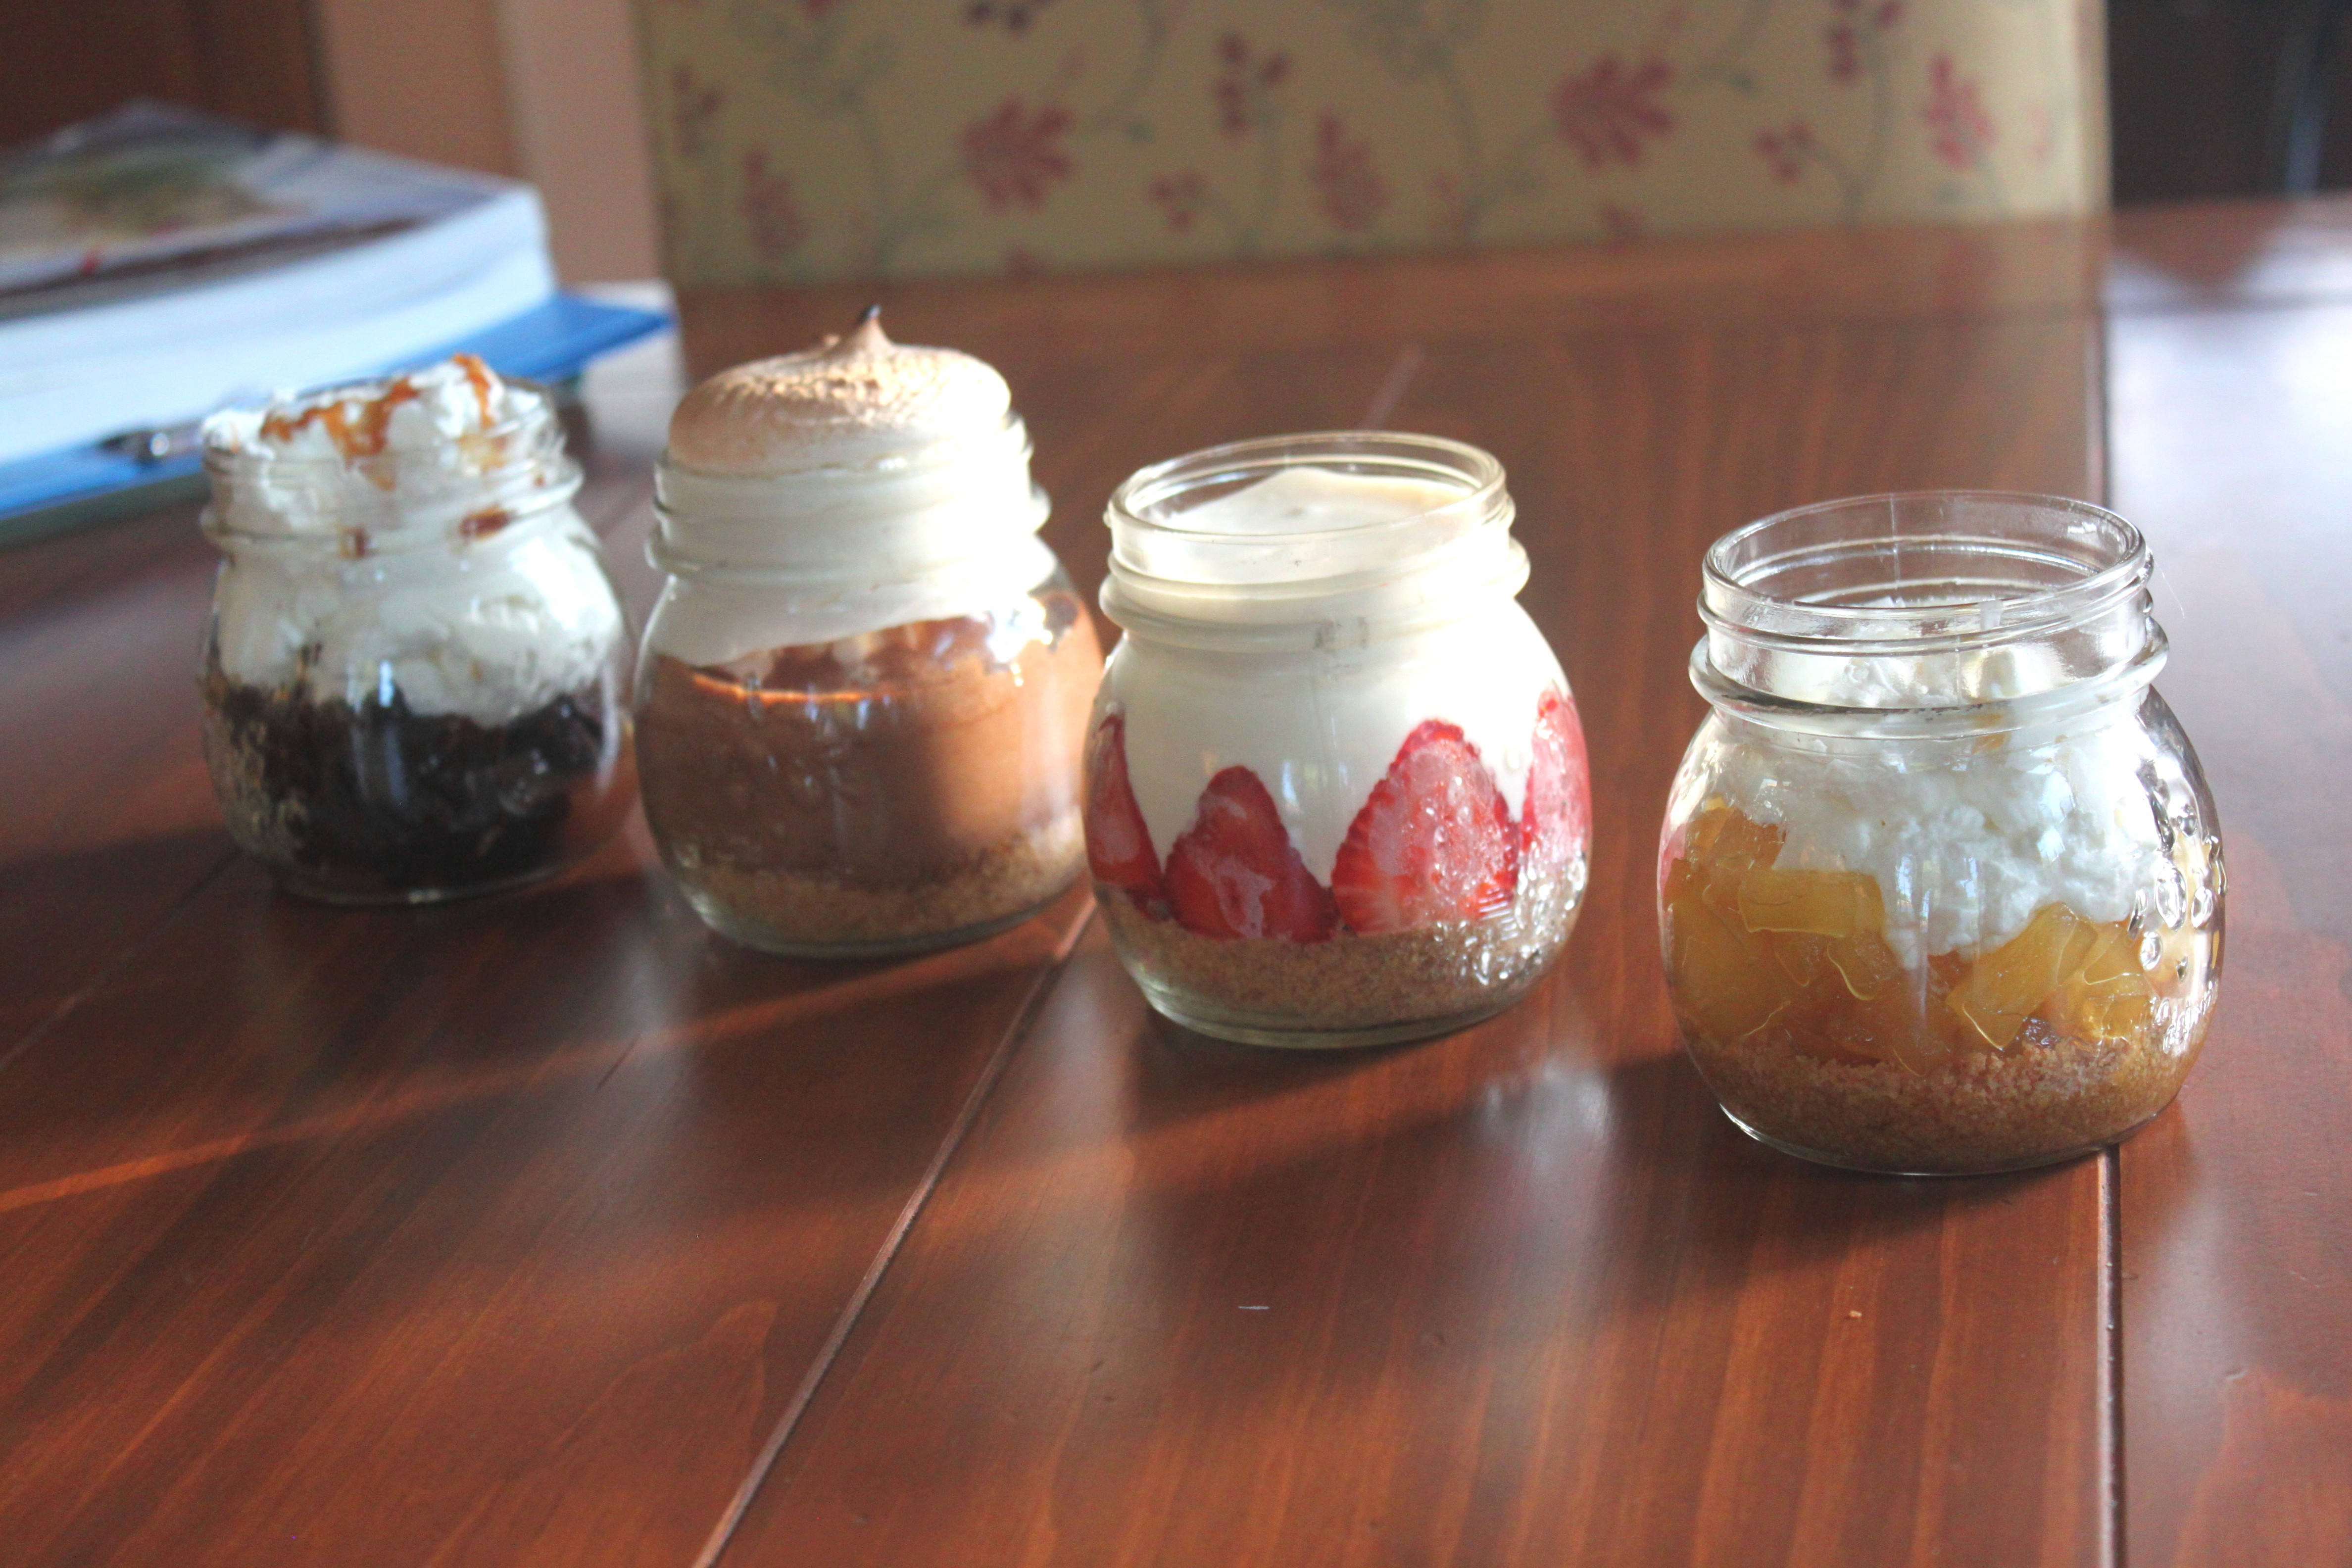 Desserts In Mason Jar  Mason Jar Desserts 4 Ways I've Sold My Soul to